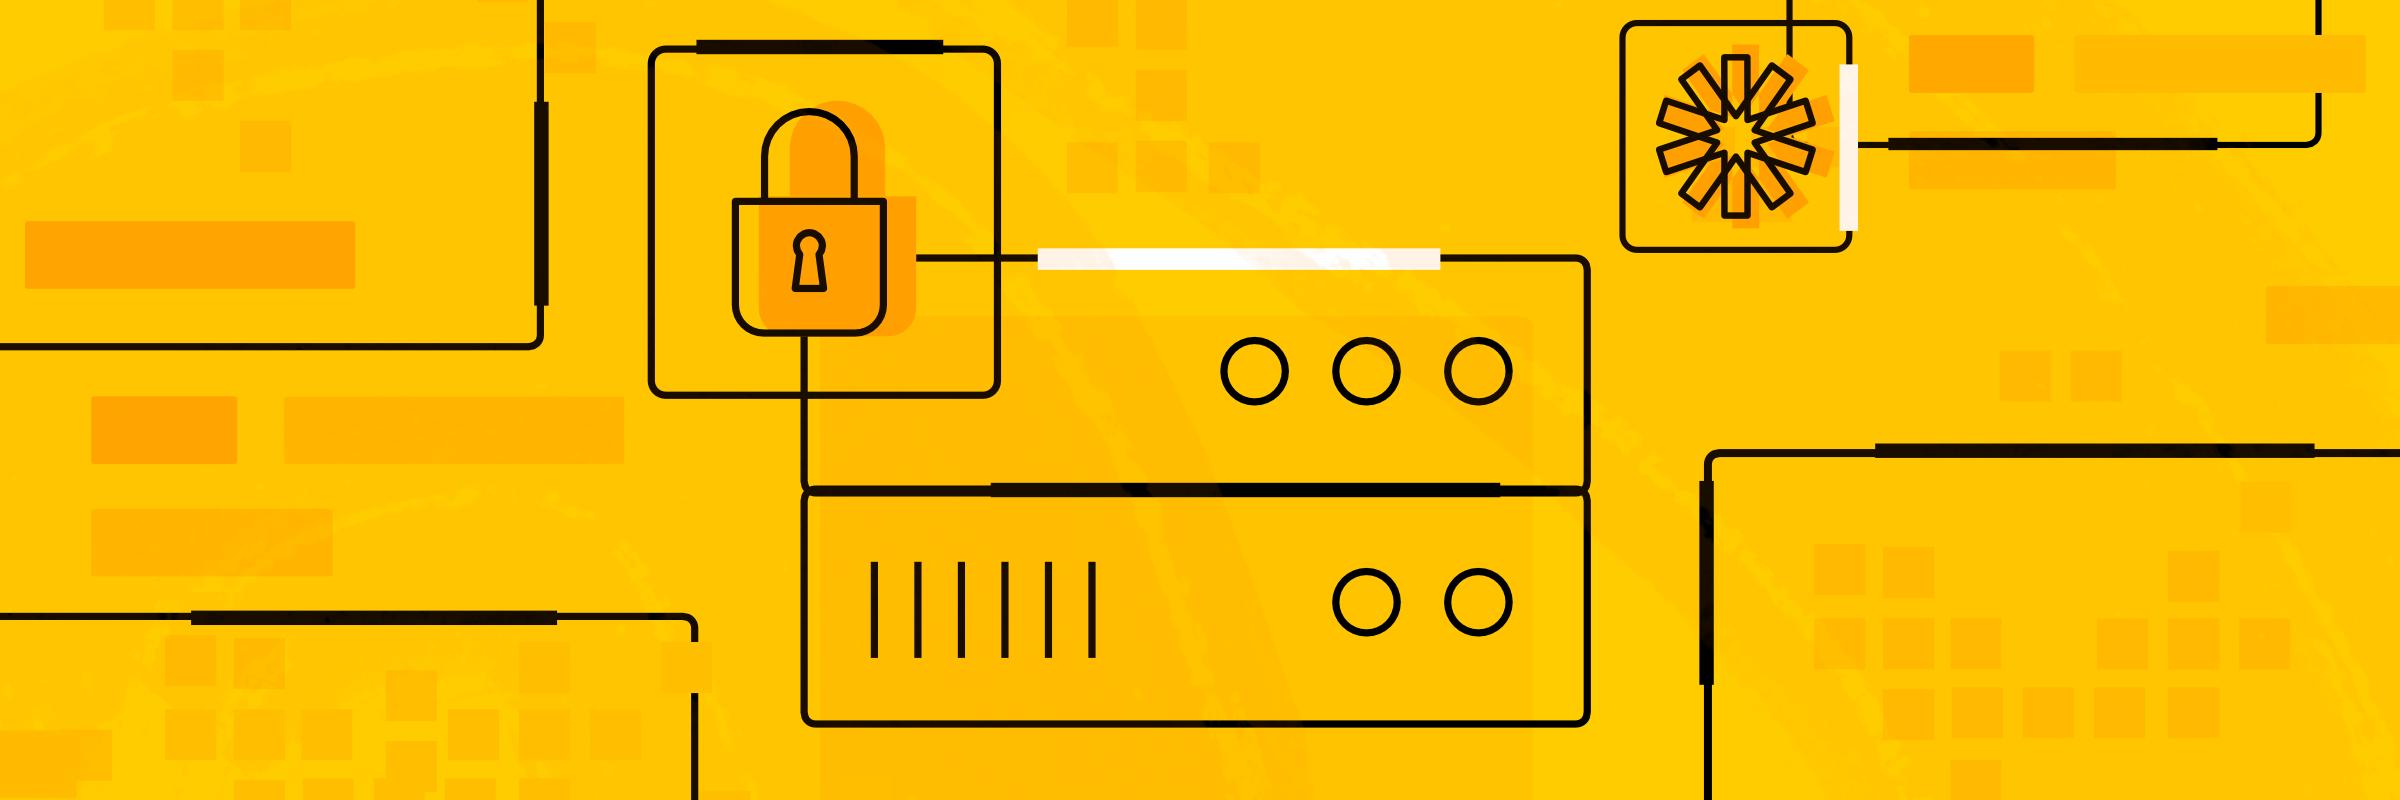 Securing Node and Express RESTful API with Json Web Token (JWT)